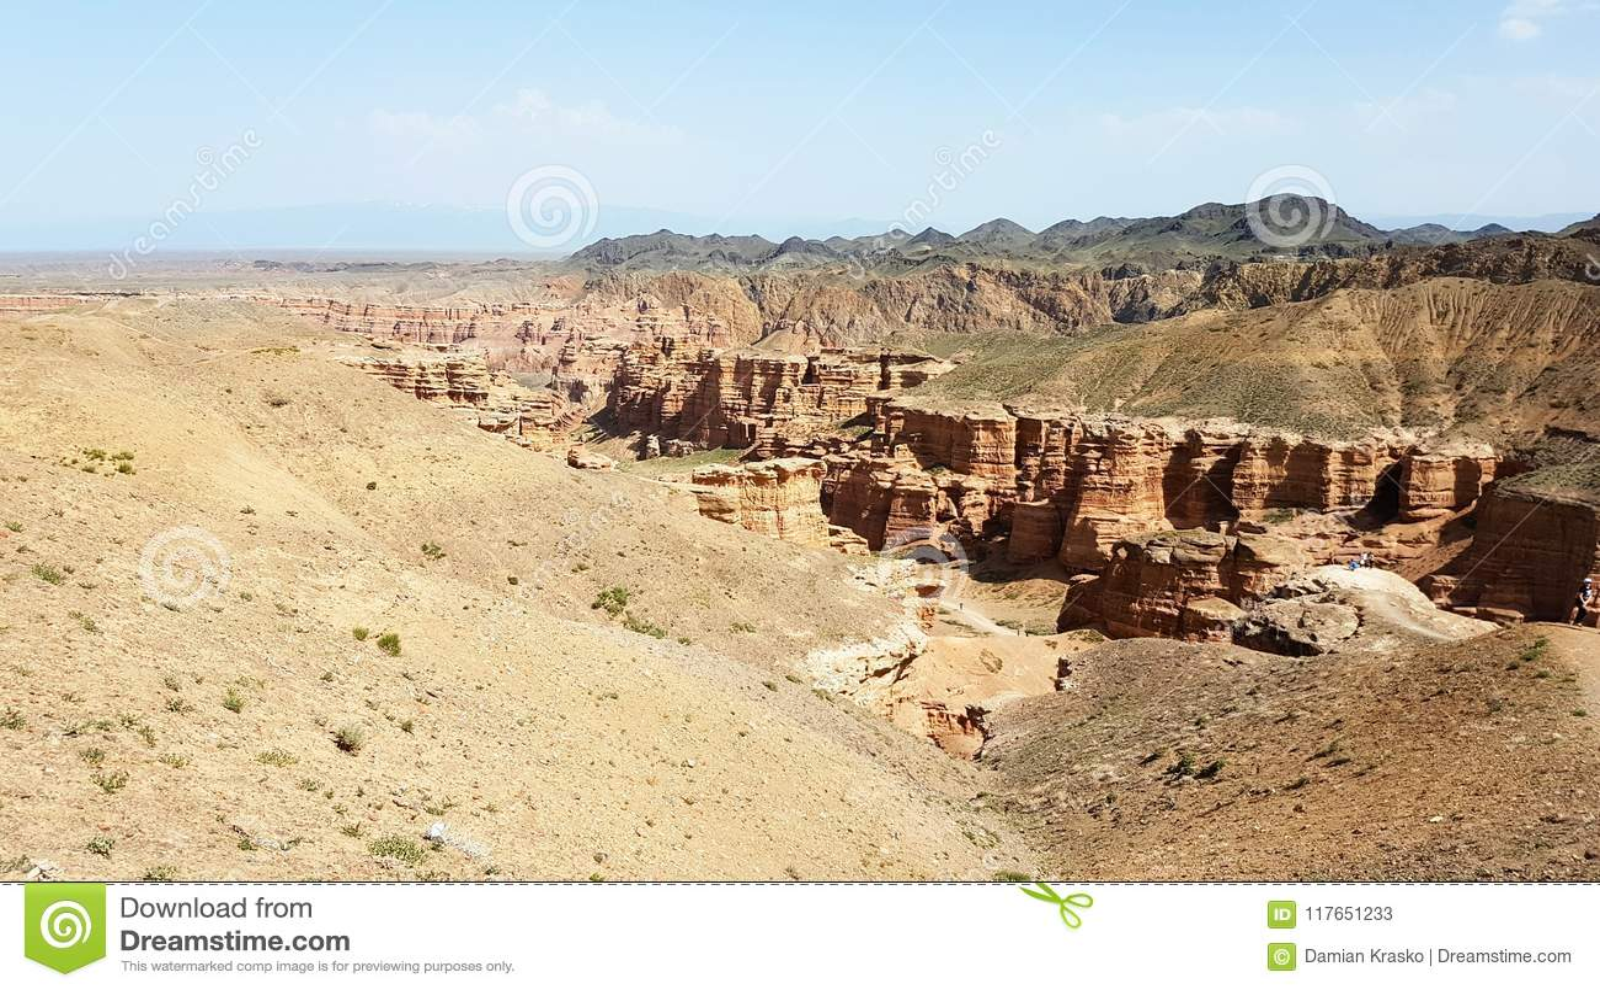 Charyncanion in Kasachstan